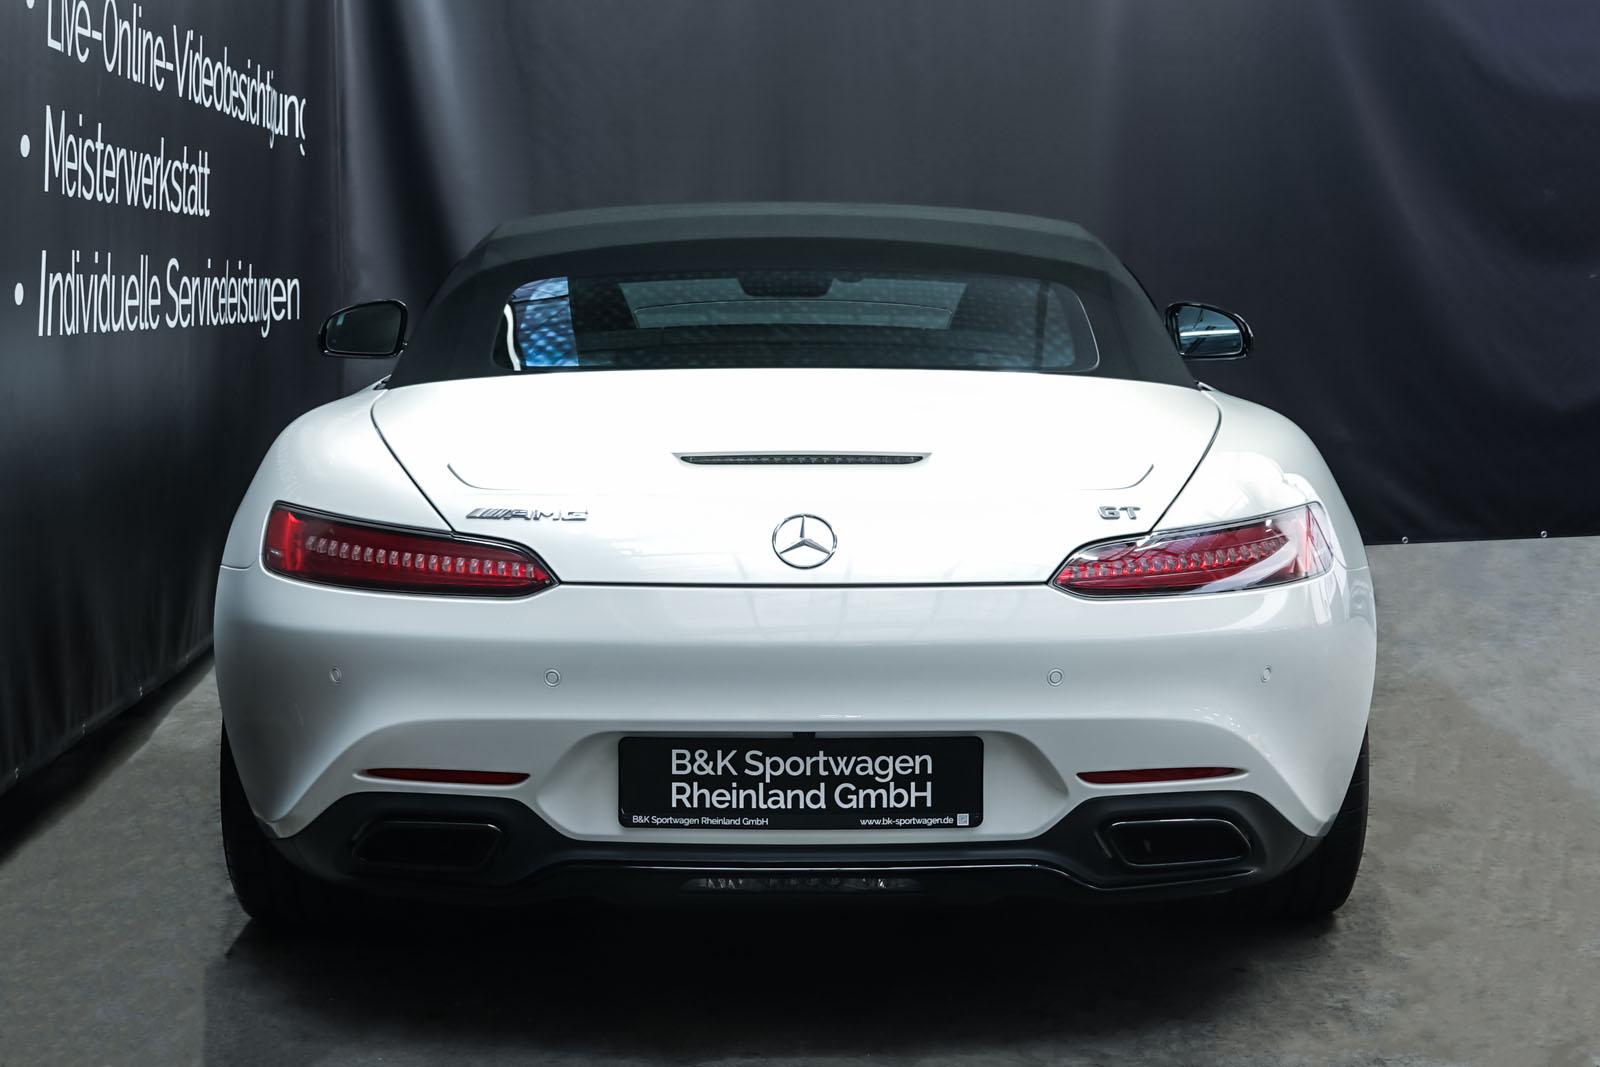 11Mercedes_Benz_AMG_GT_Roadster_Weiss_Schwarz_MB-9710_24_w